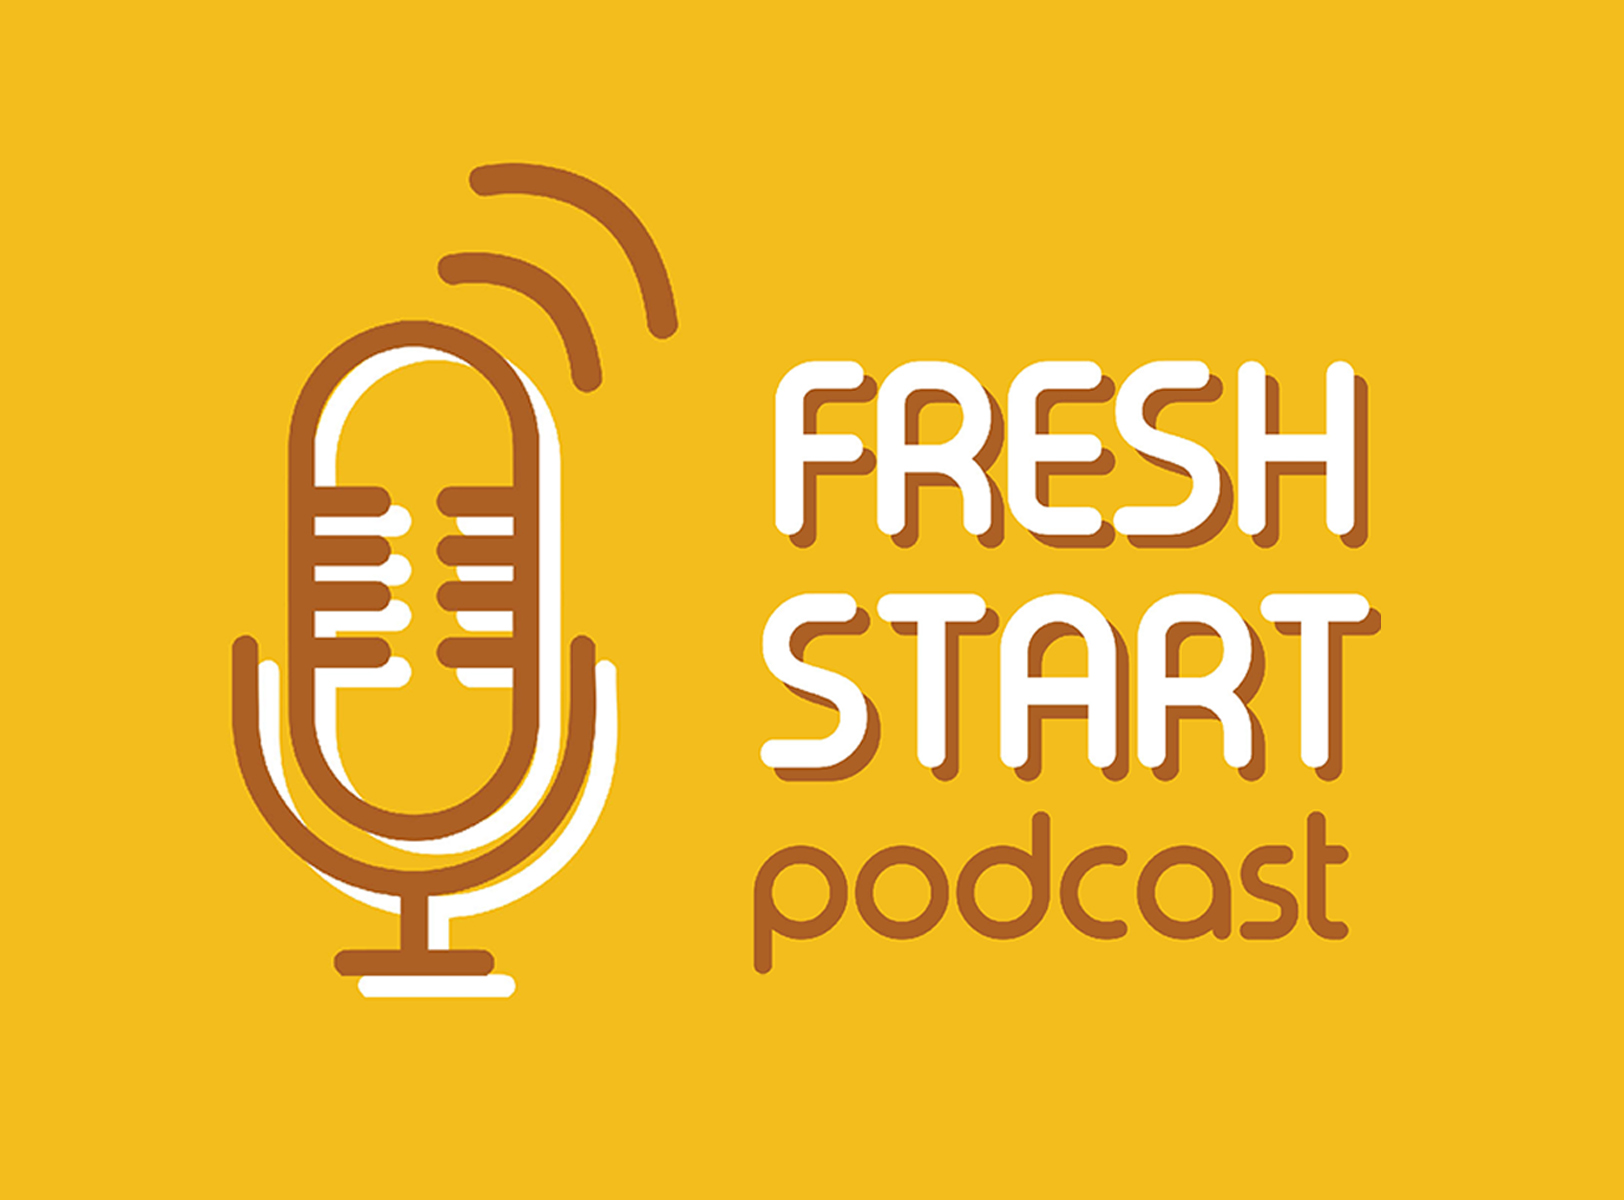 Fresh Start: Podcast News (6/23/2019 Sun.)